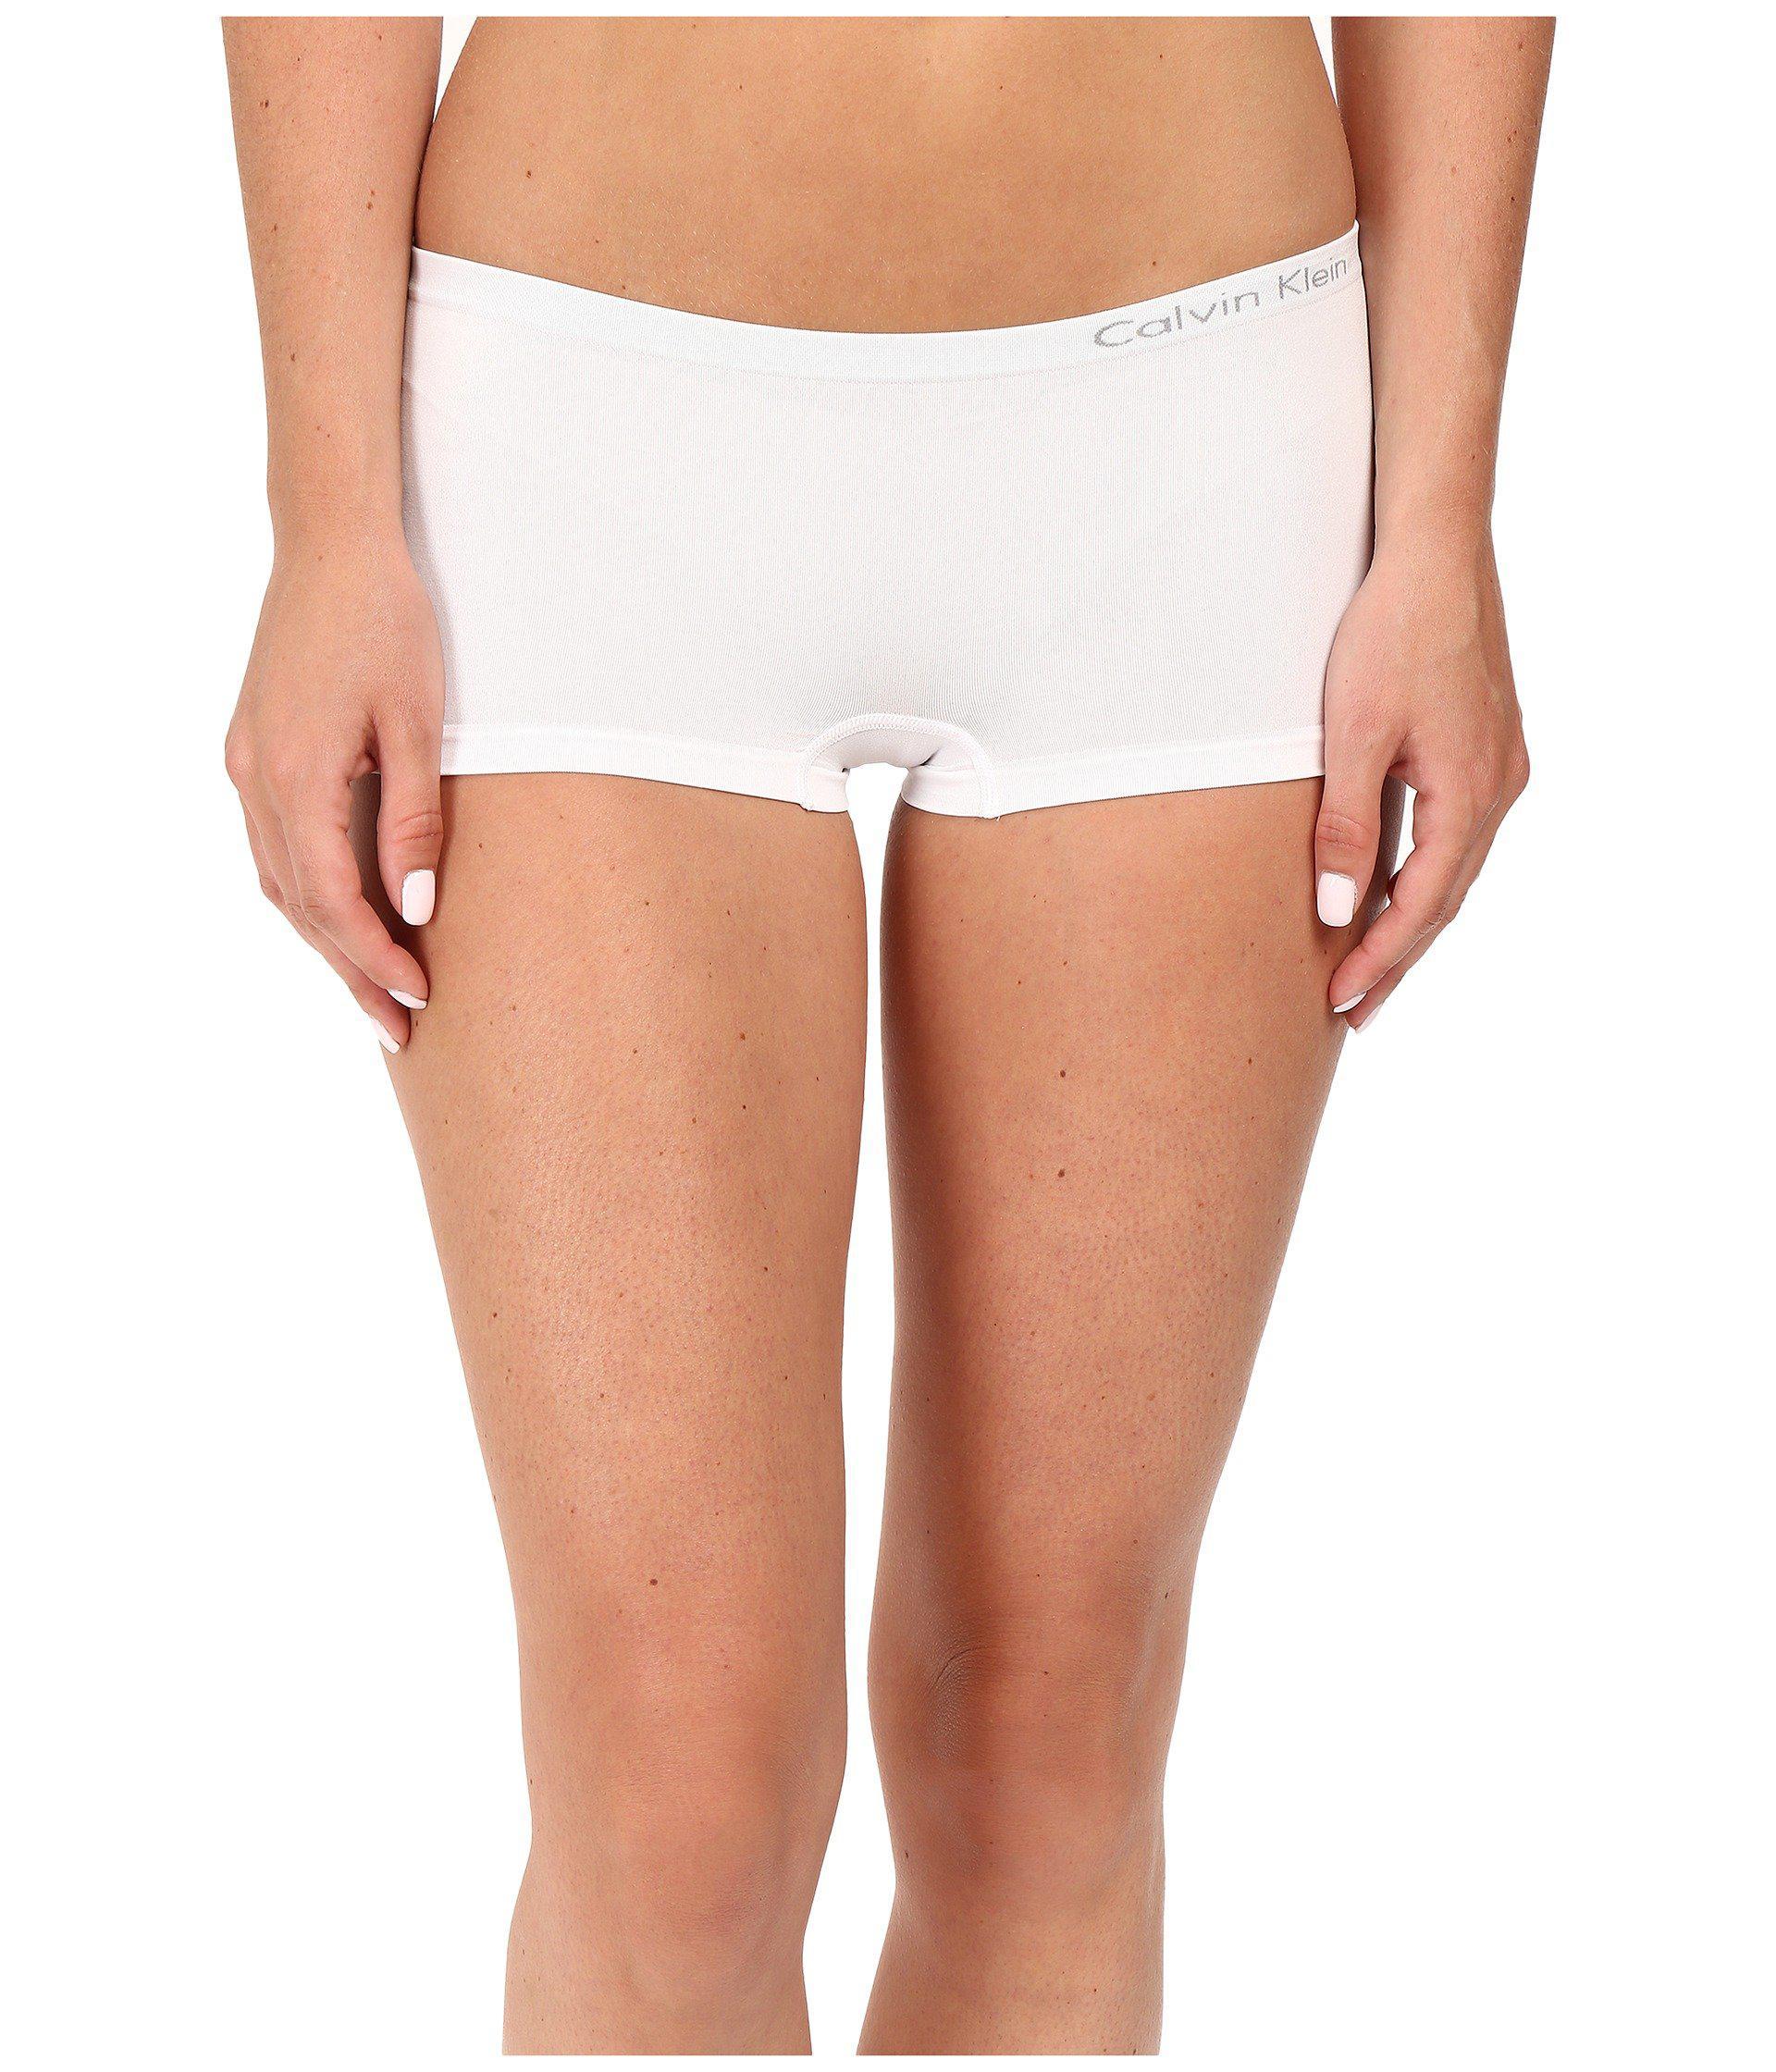 fdd106b46b00 Calvin Klein Pure Seamless 3-pack Boyshorts (bare/black/white ...